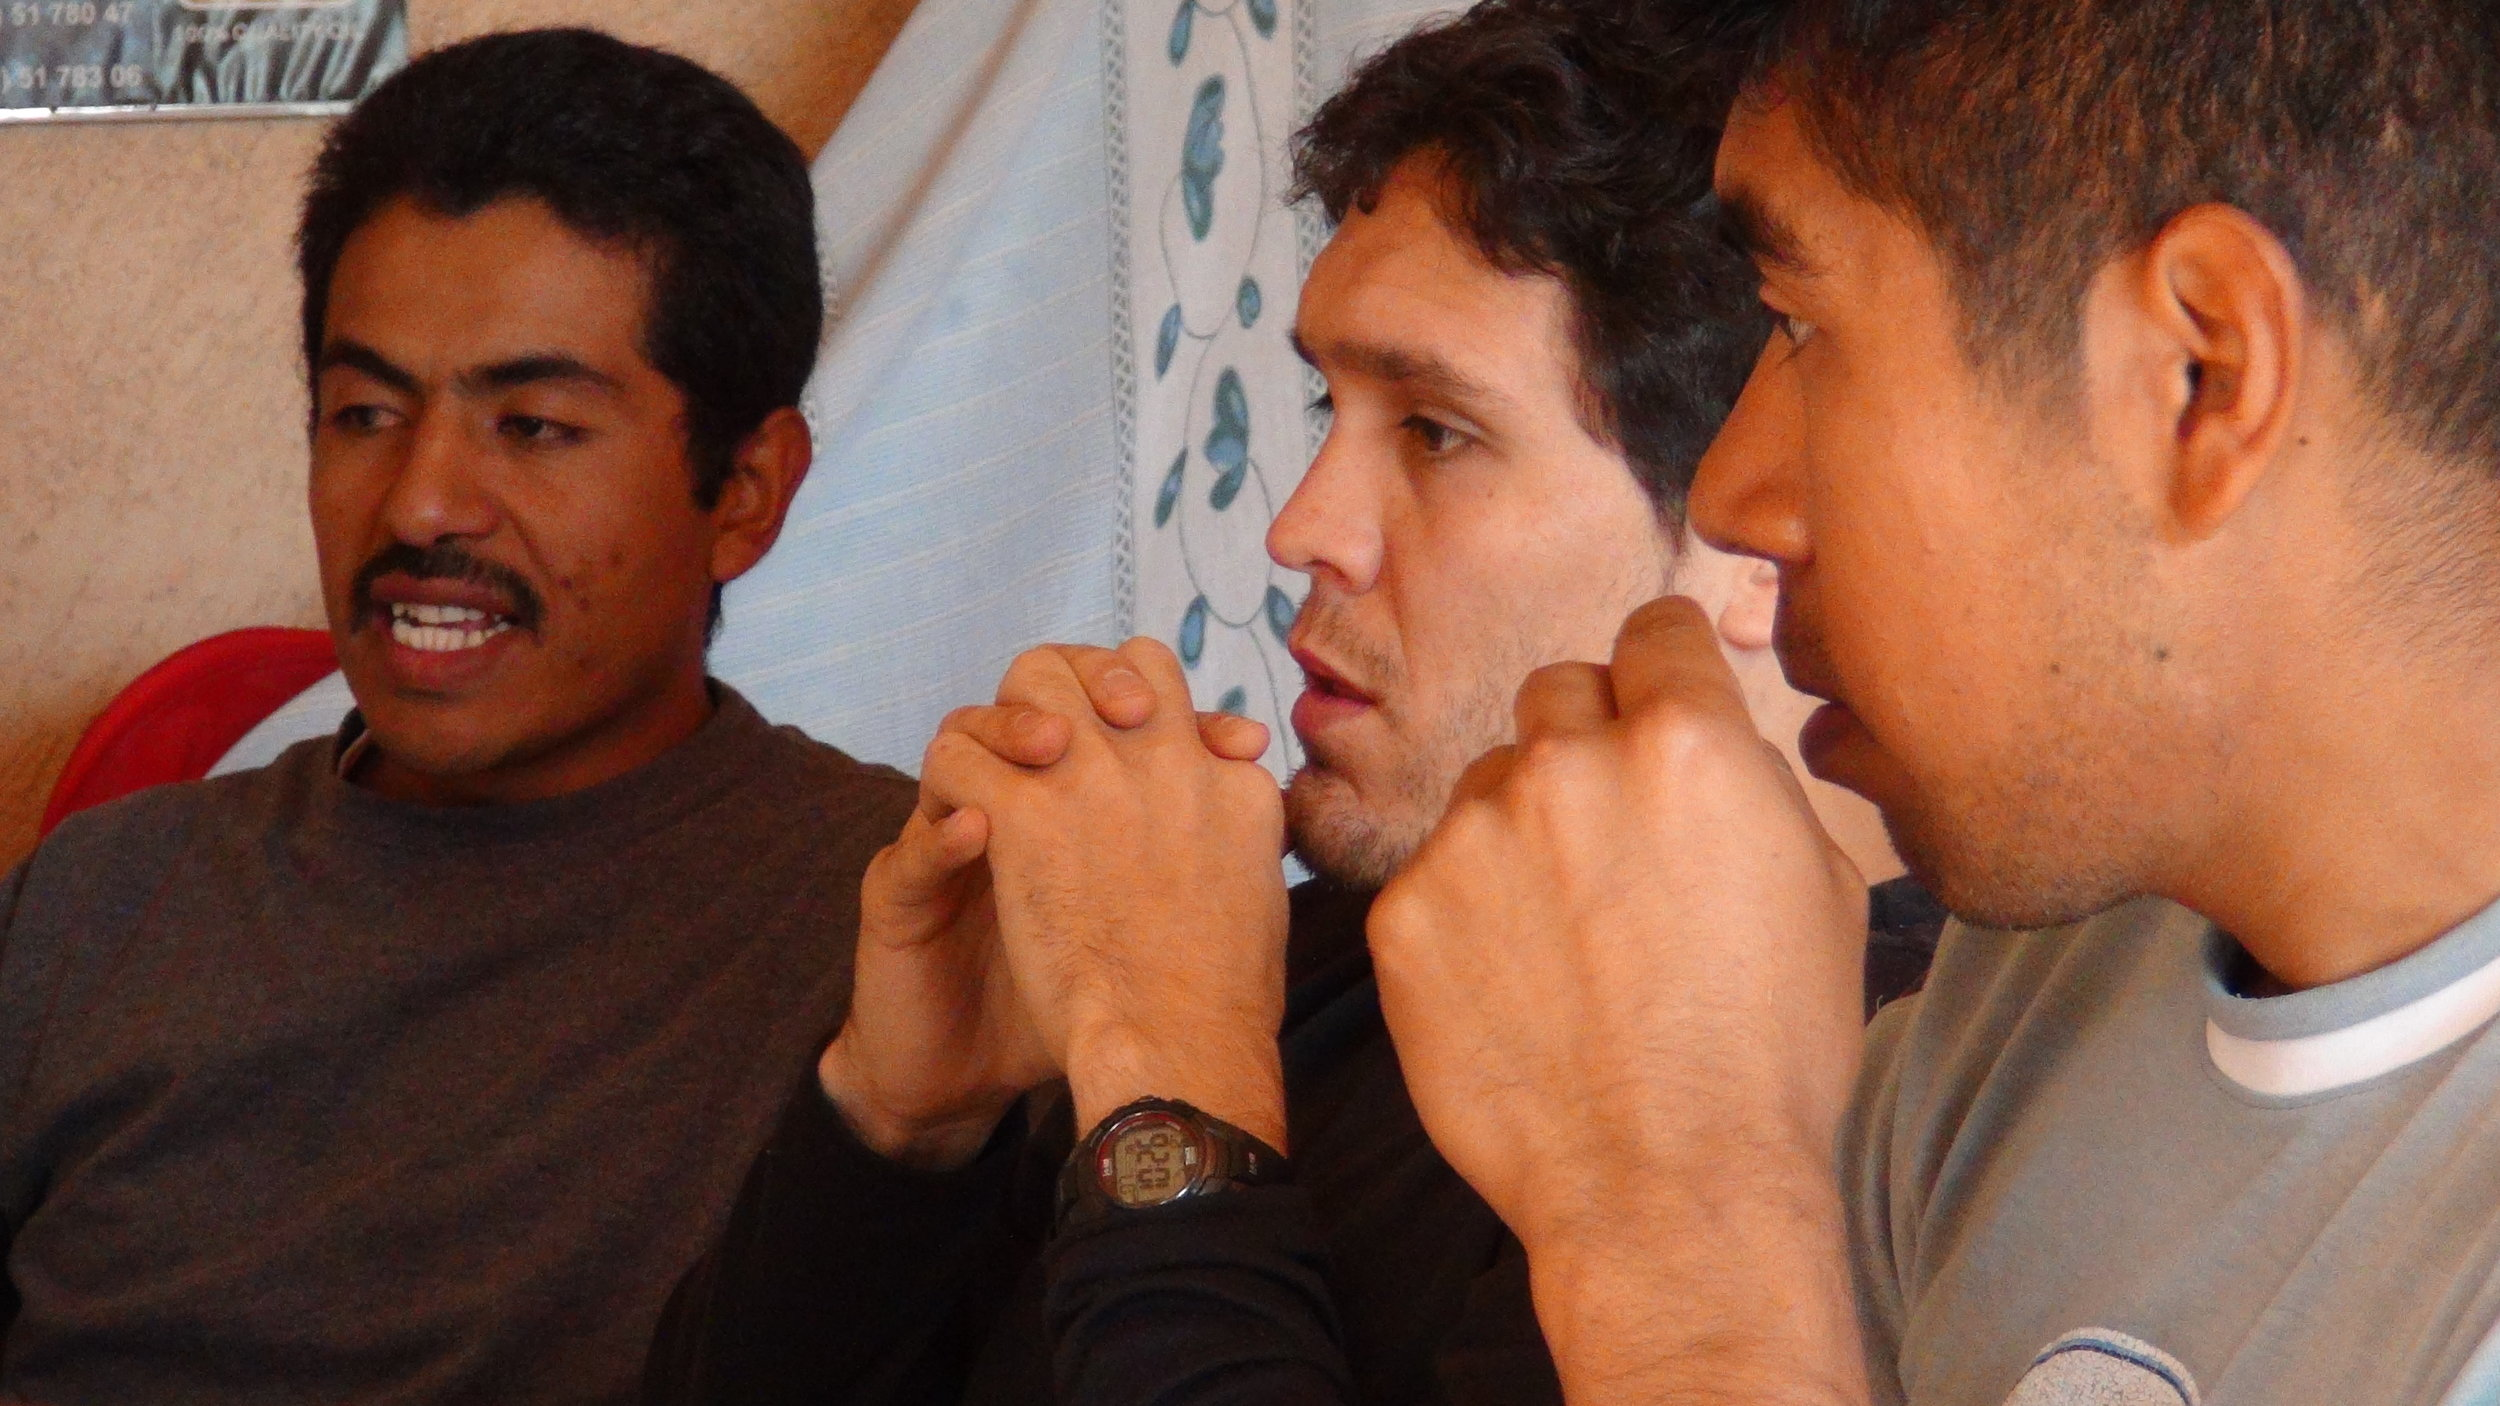 Daniel Quintanilla (center) mentors visual literacy with Mixe Community Self Documentation team members.